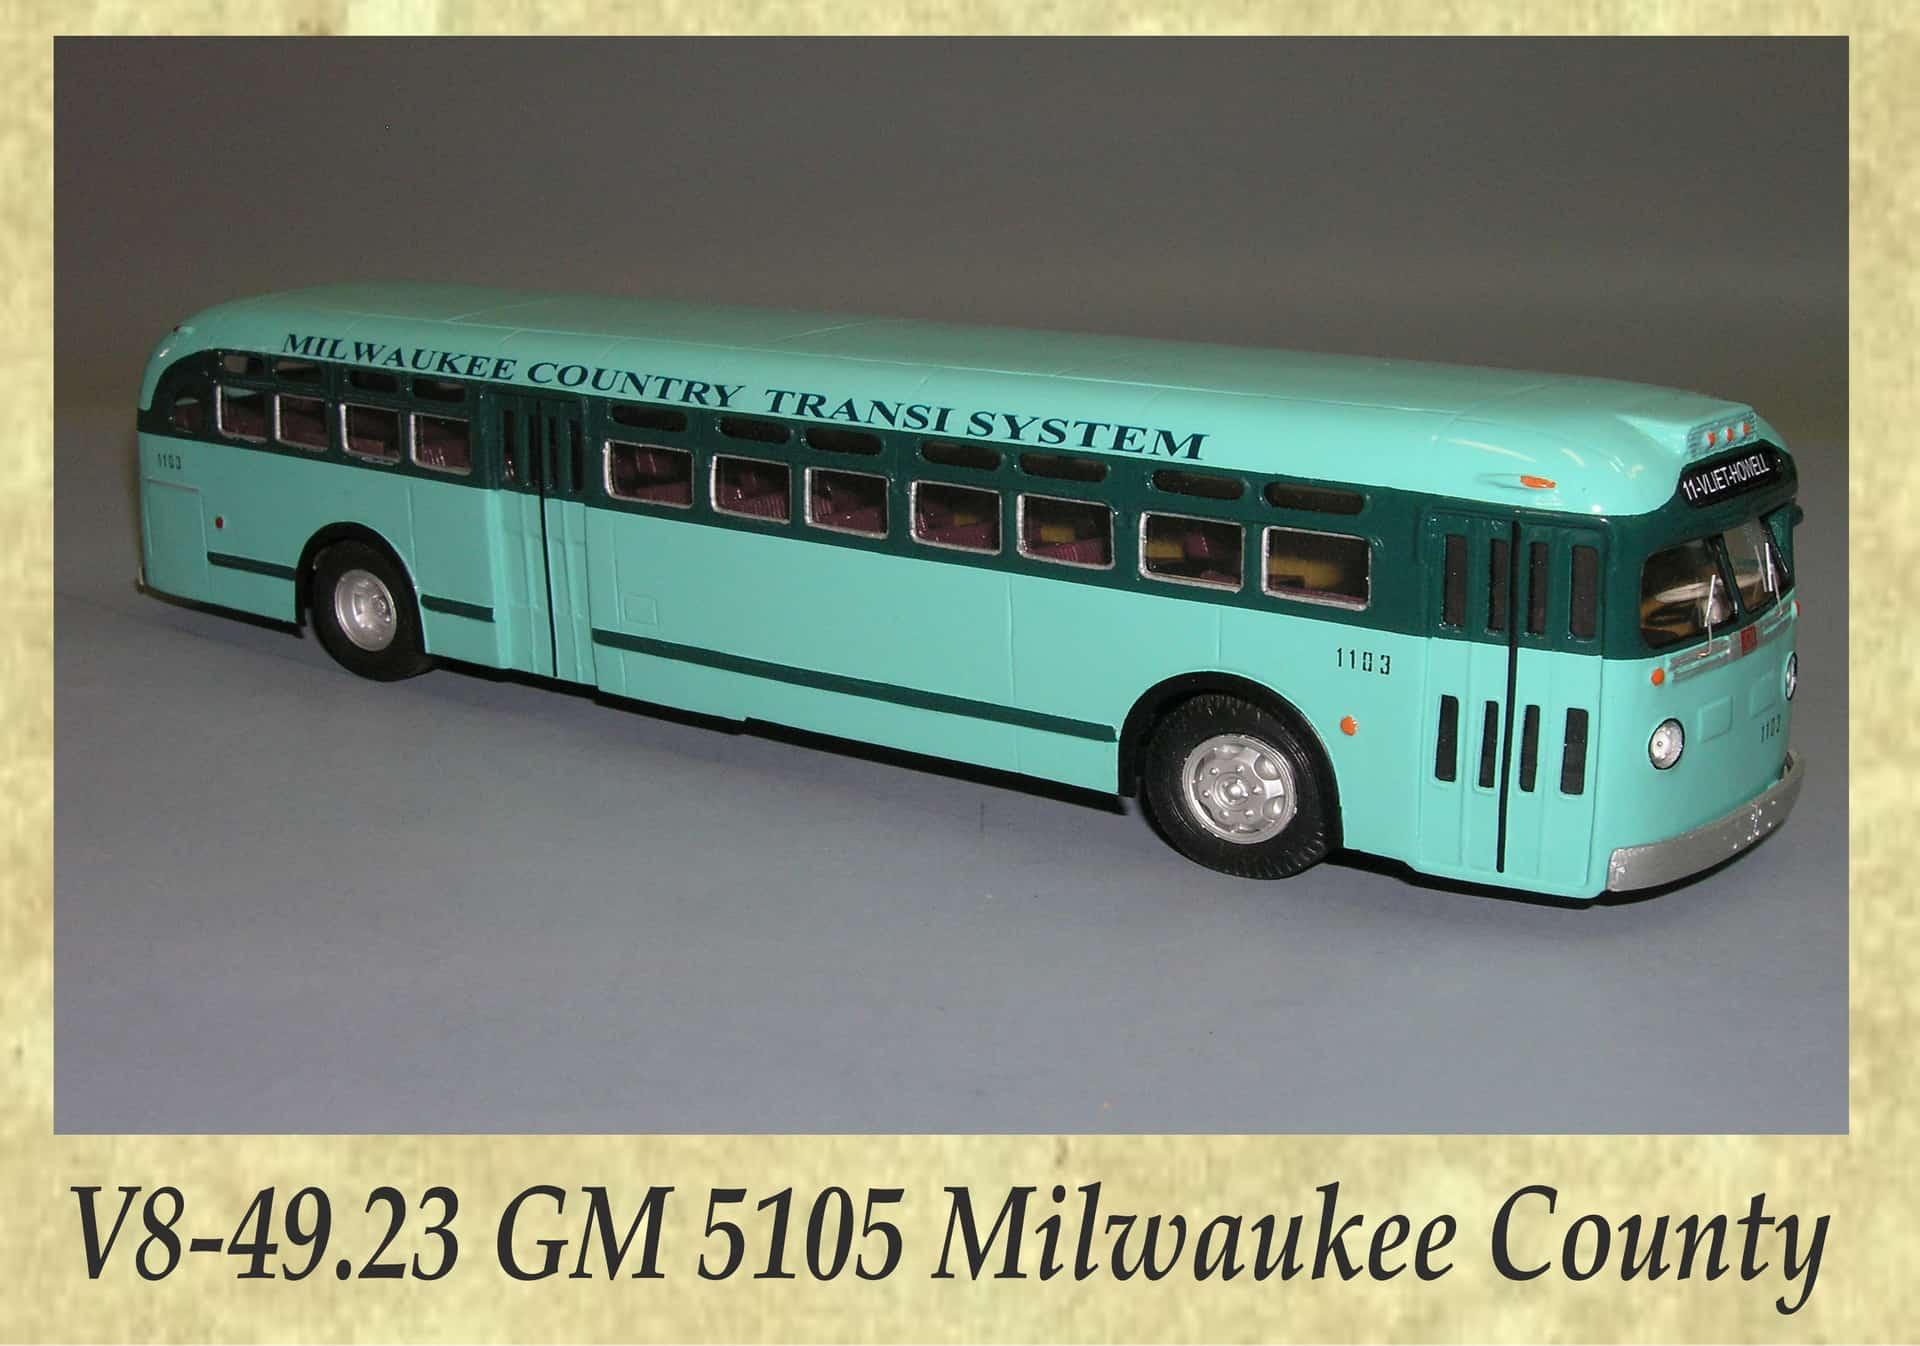 V8-49.23 GM 5105 Milwaukee County